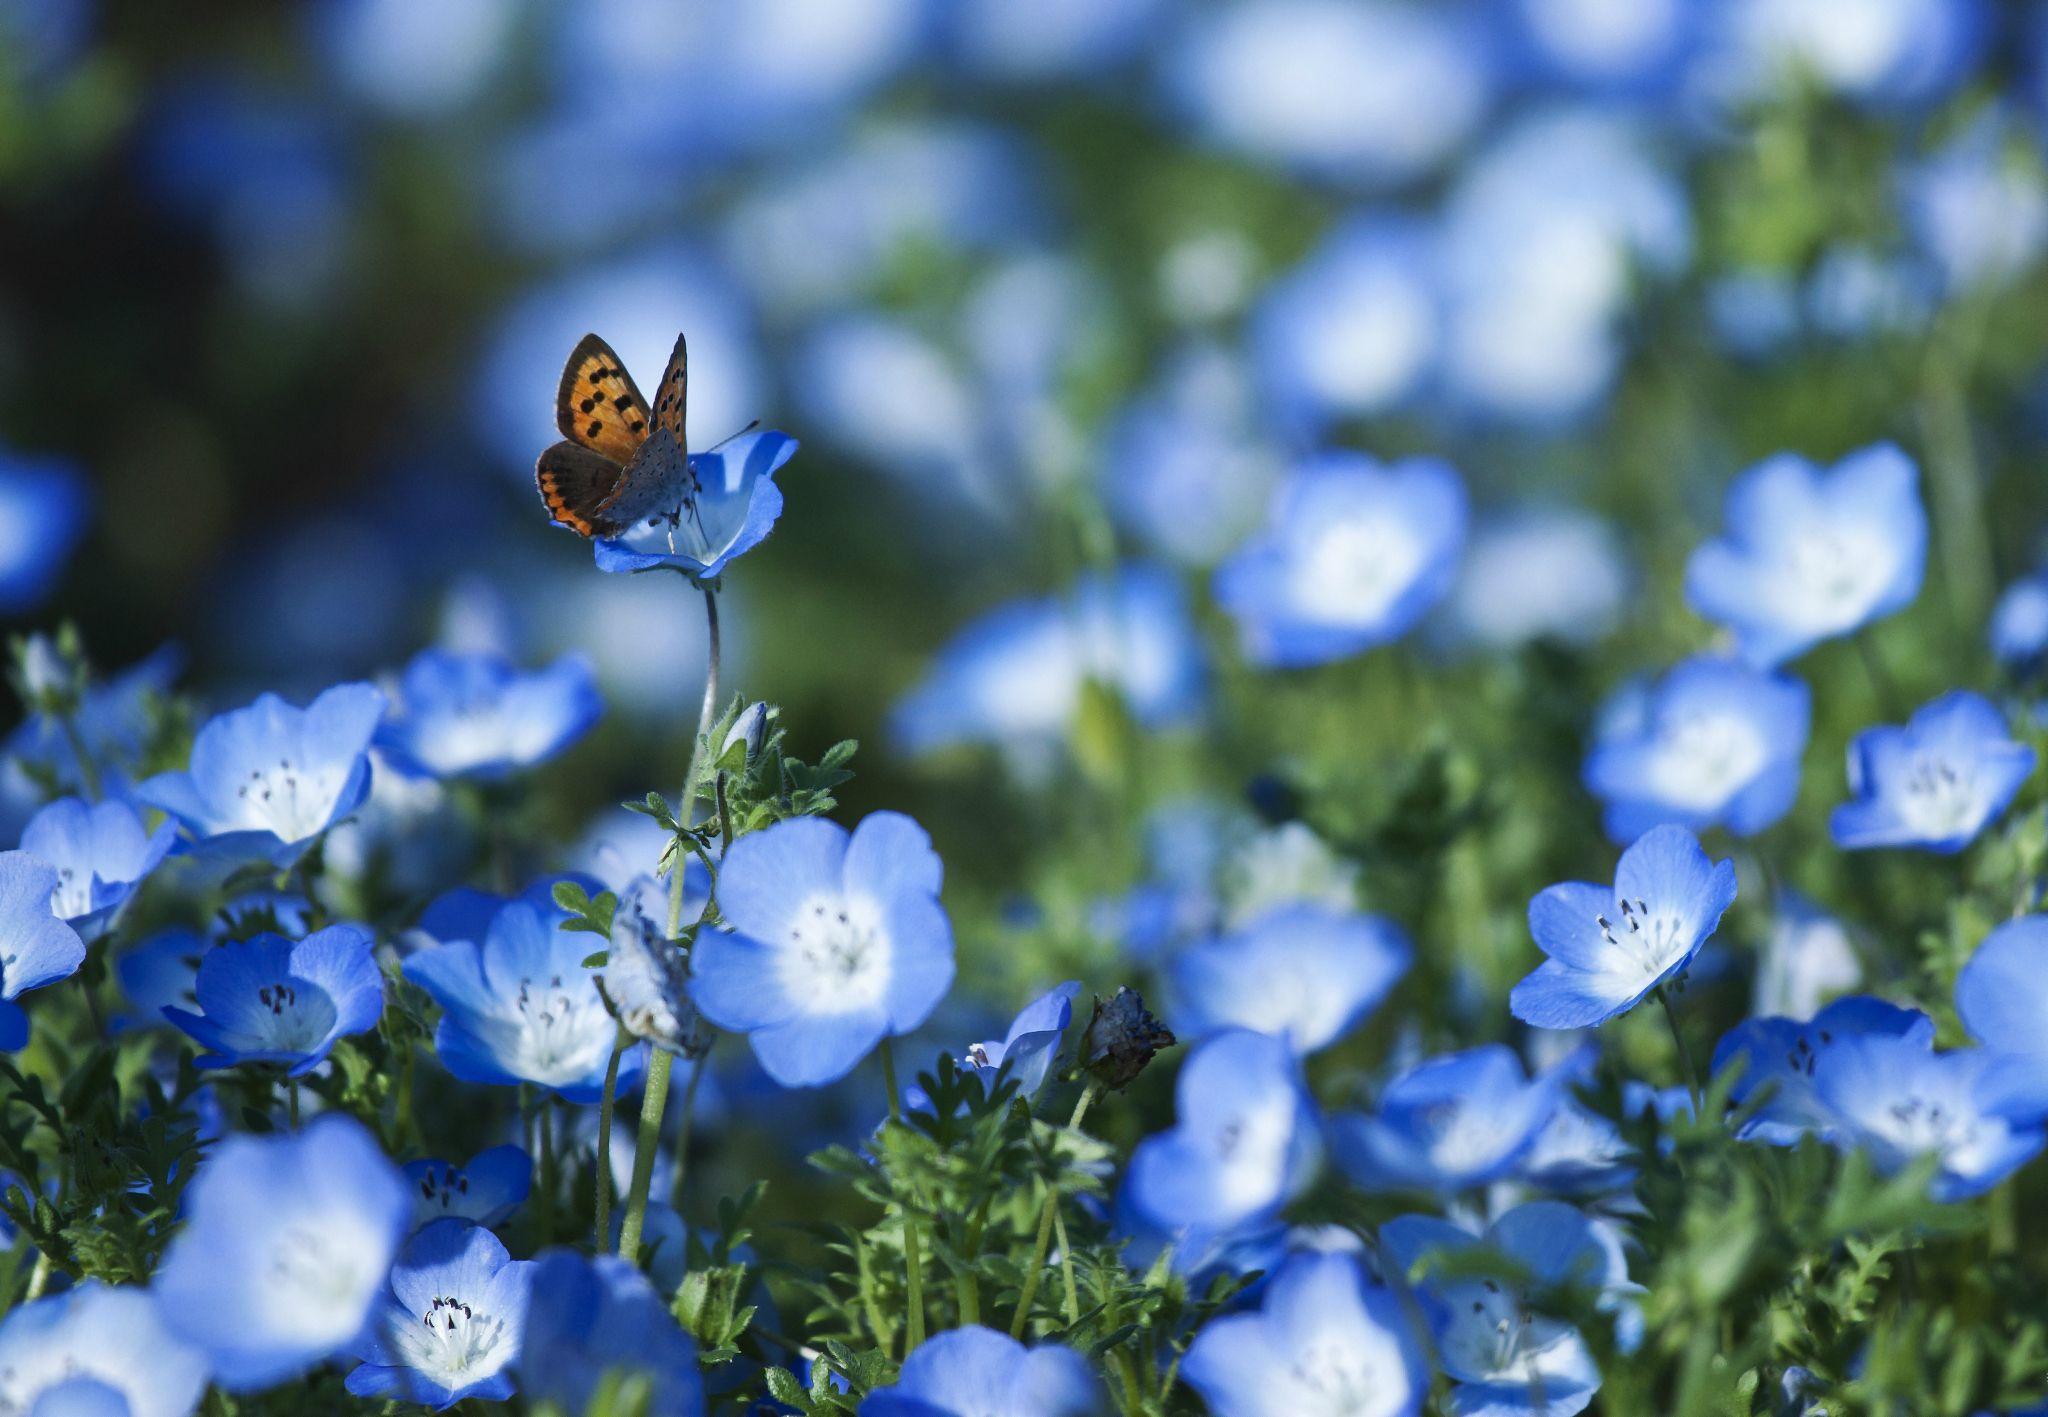 Spring Flowers And Butterflies Spring flowers, Flowers